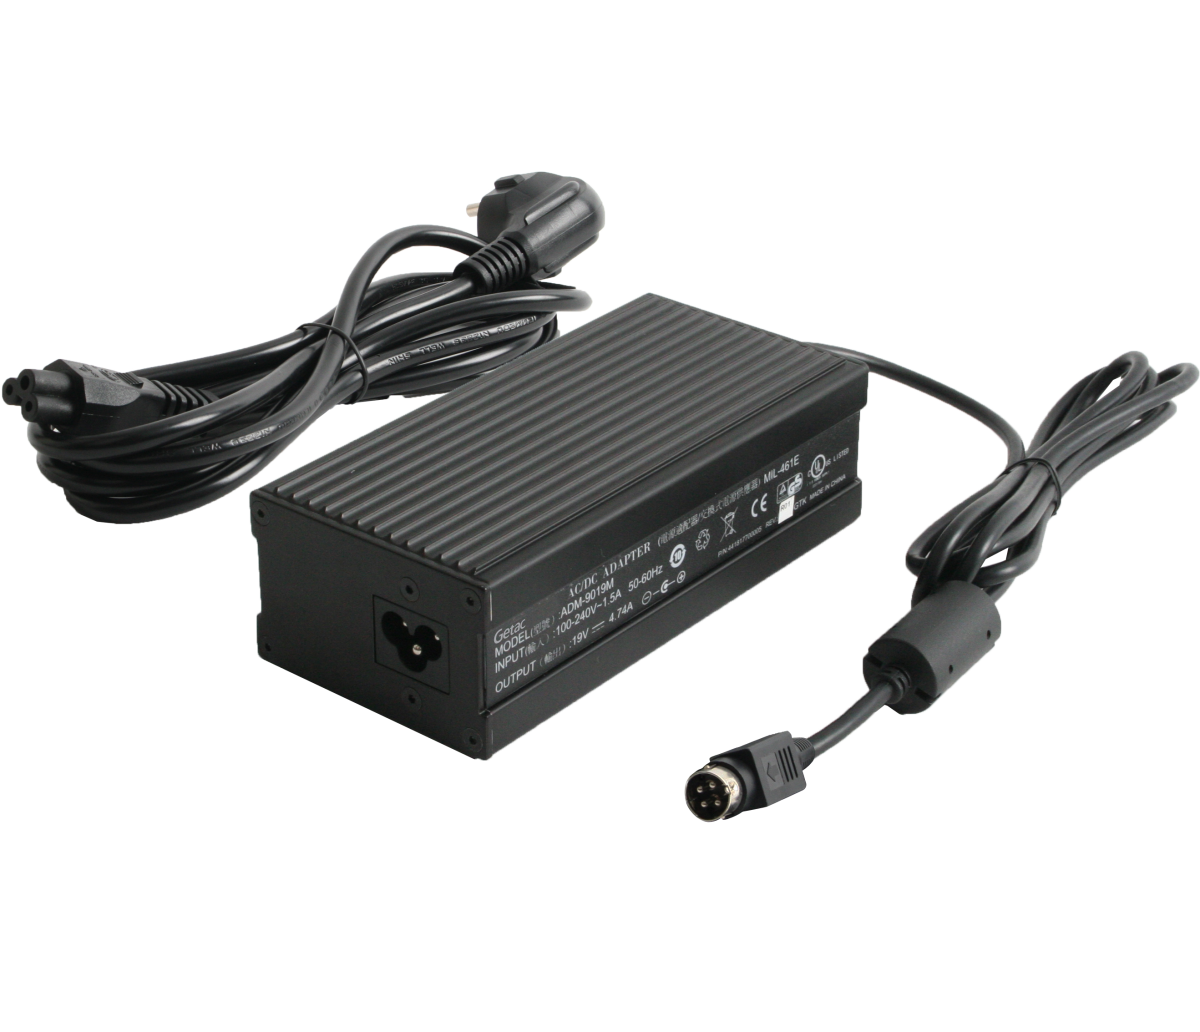 Certified-Militar-AC-Adapter-Getac-X500(png)